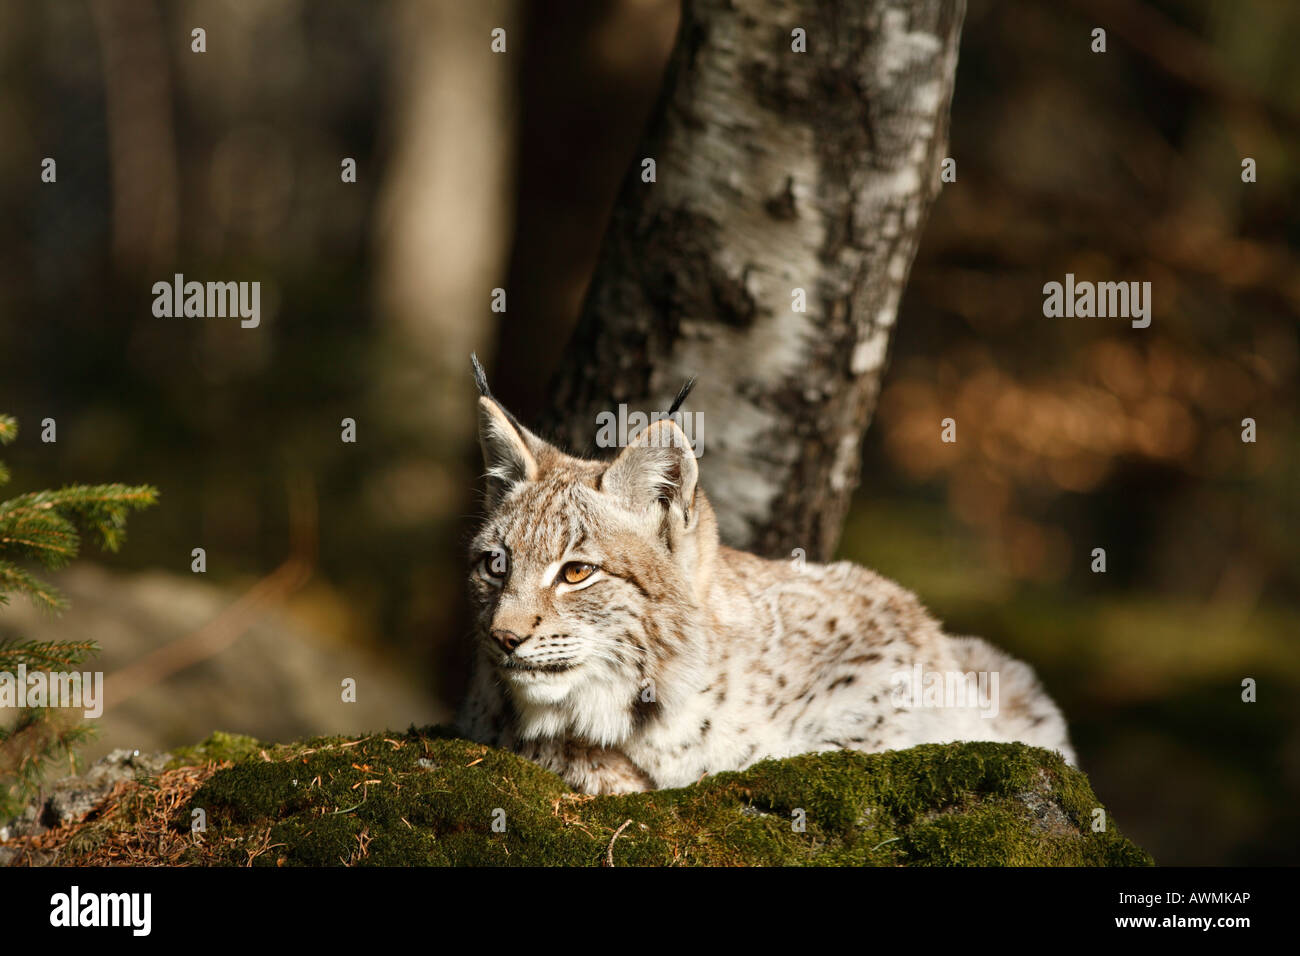 Eurasian Lynx (Lynx lynx) in an outdoor enclosure in the Bayerischer Wald (Bavarian Forest), Lower Bavaria, Bavaria, Stock Photo